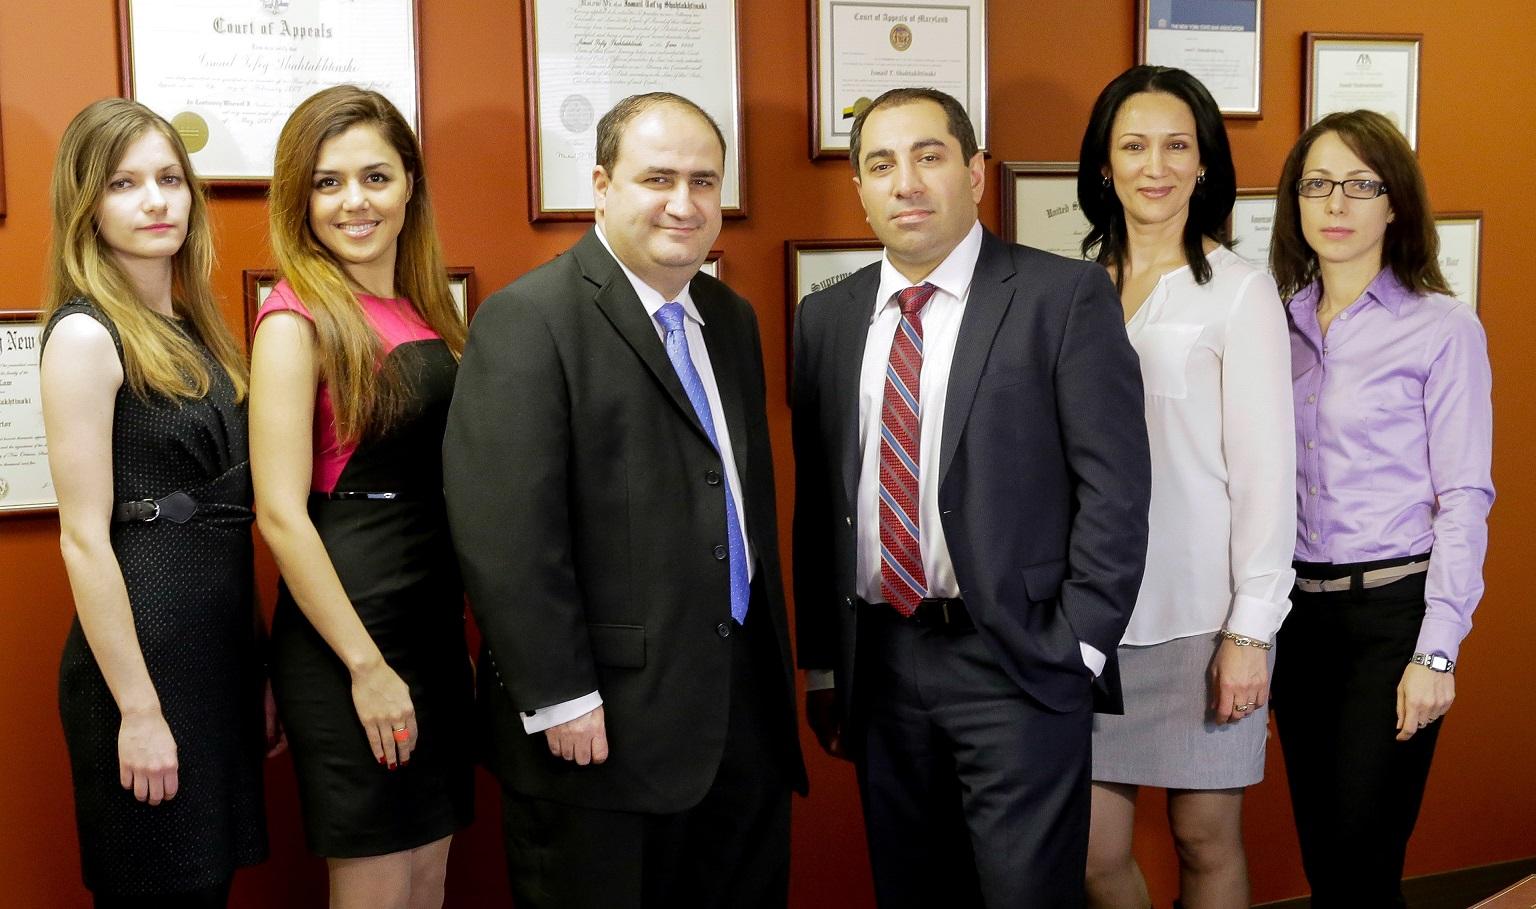 Адвокат Исмаил Шахтахниский с сотрудниками. Фото из личного архива